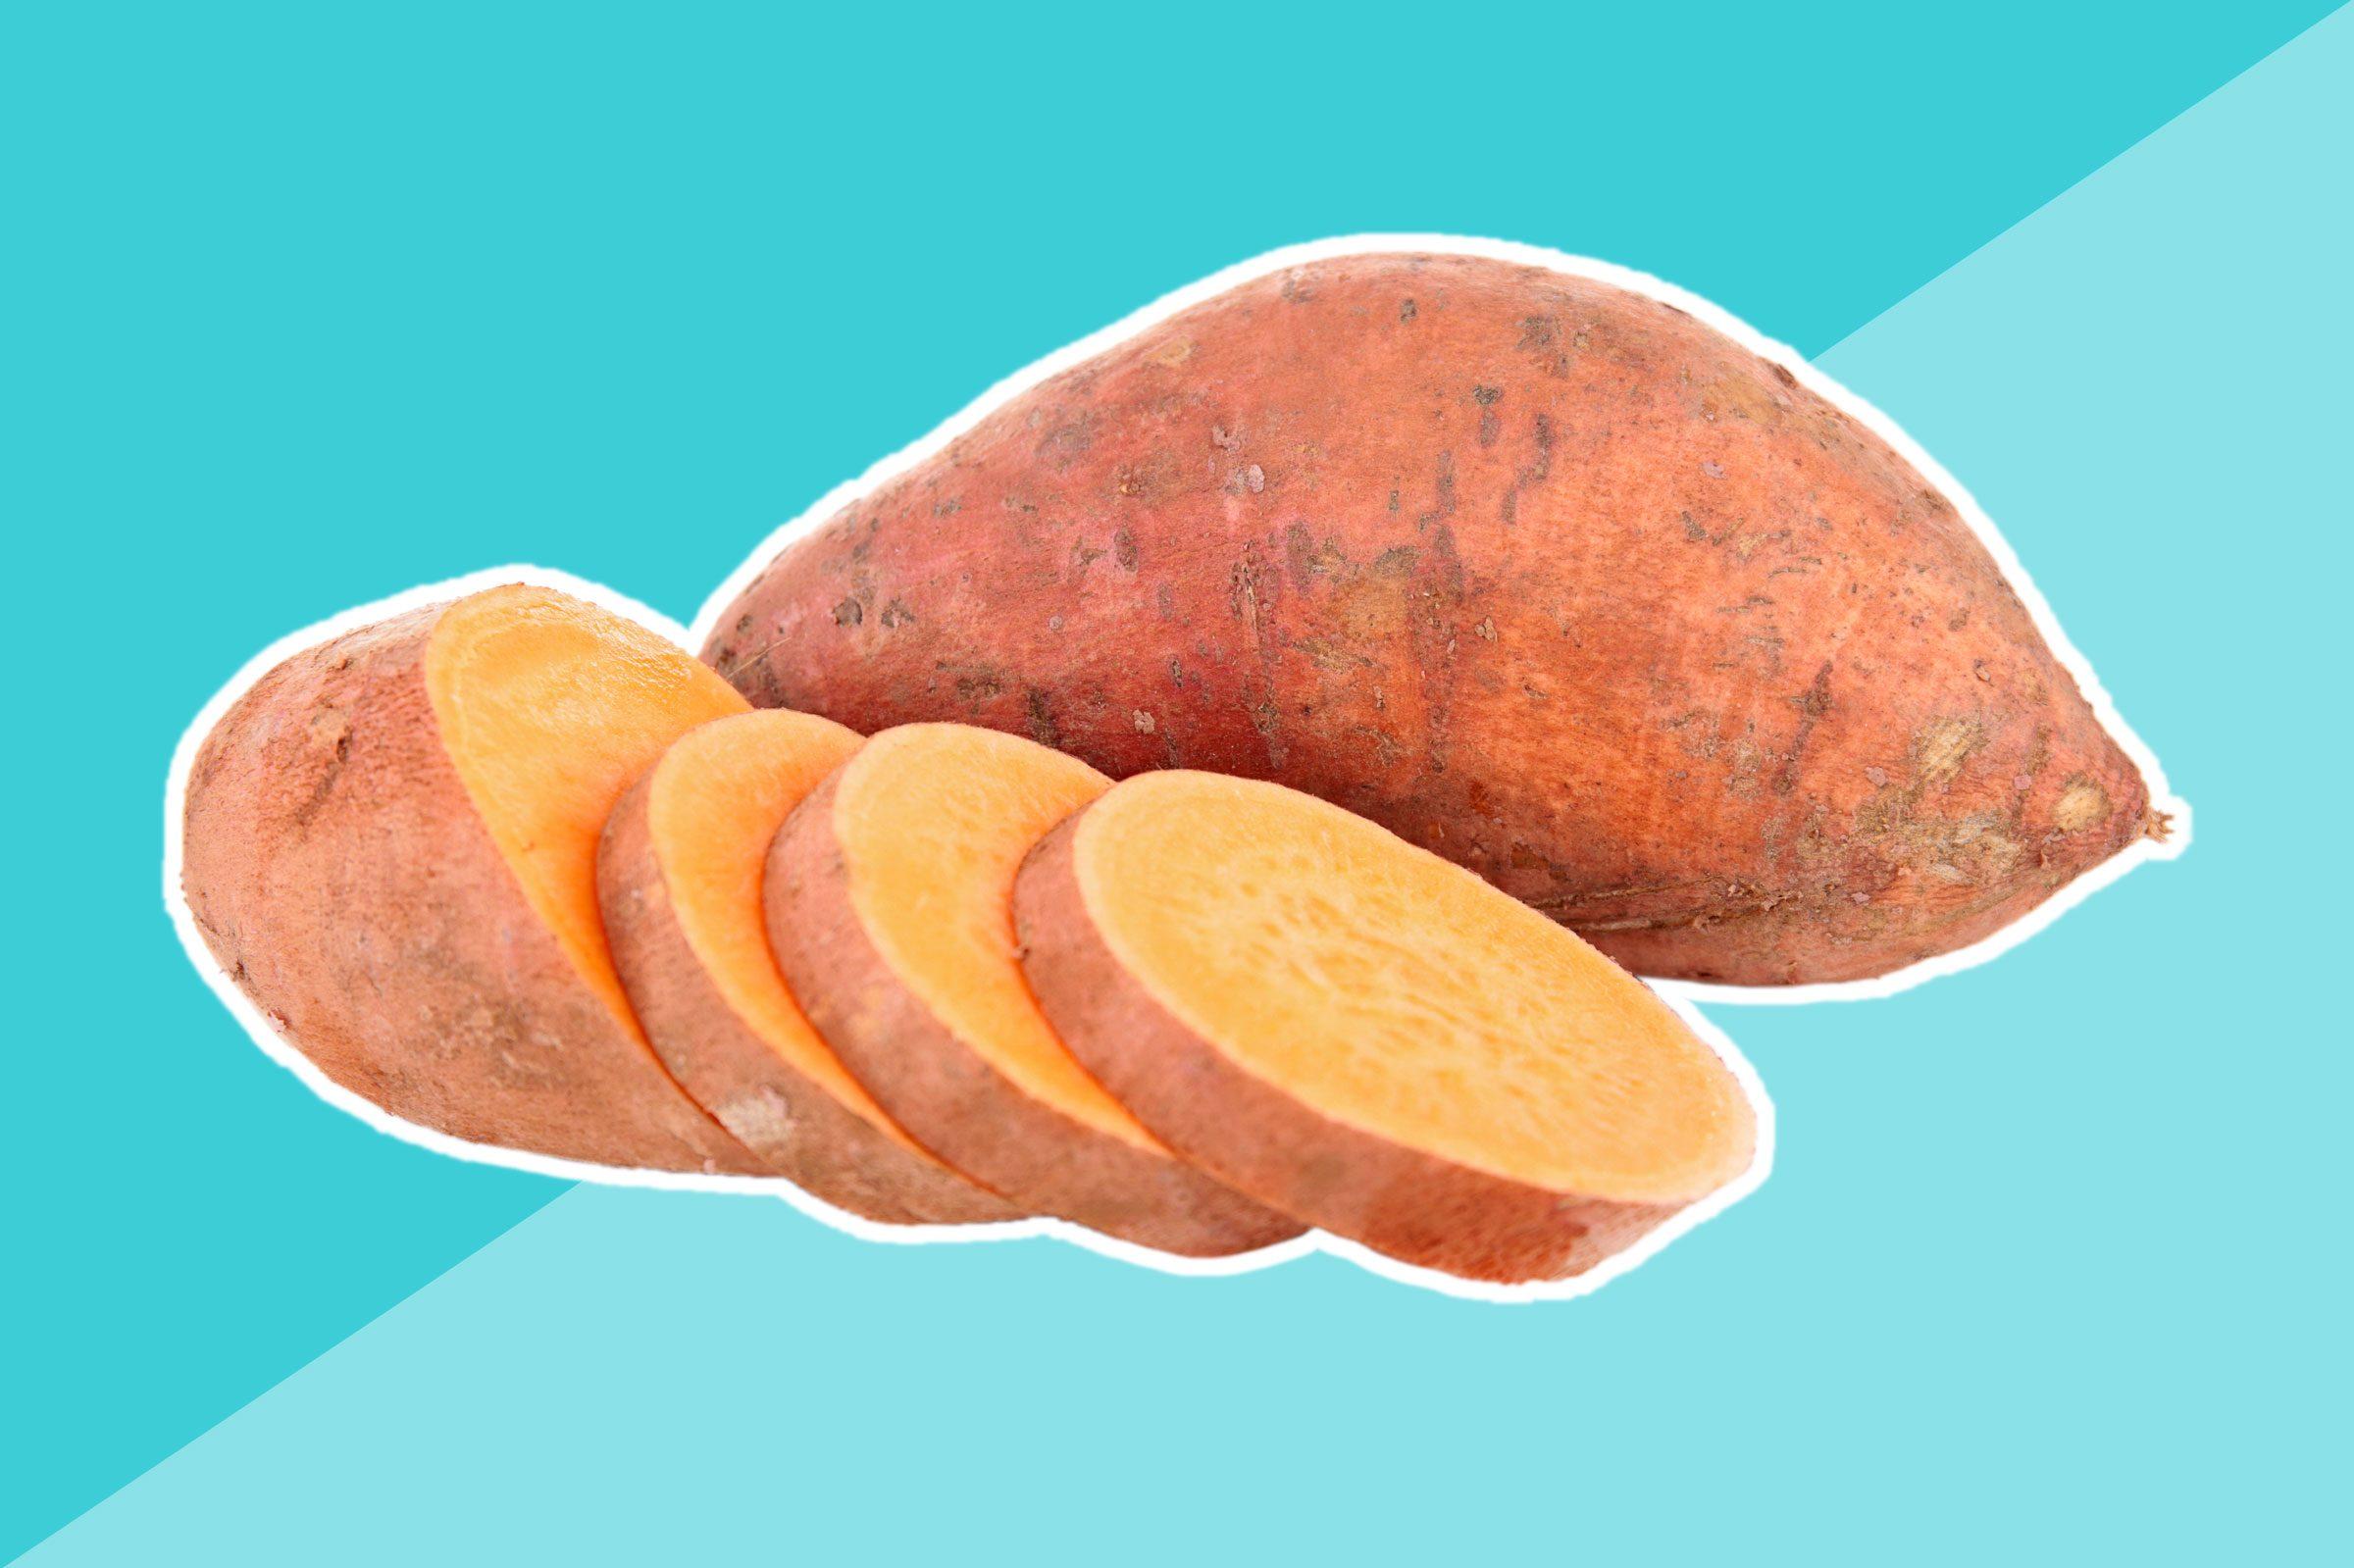 5. Sweet Potatoes